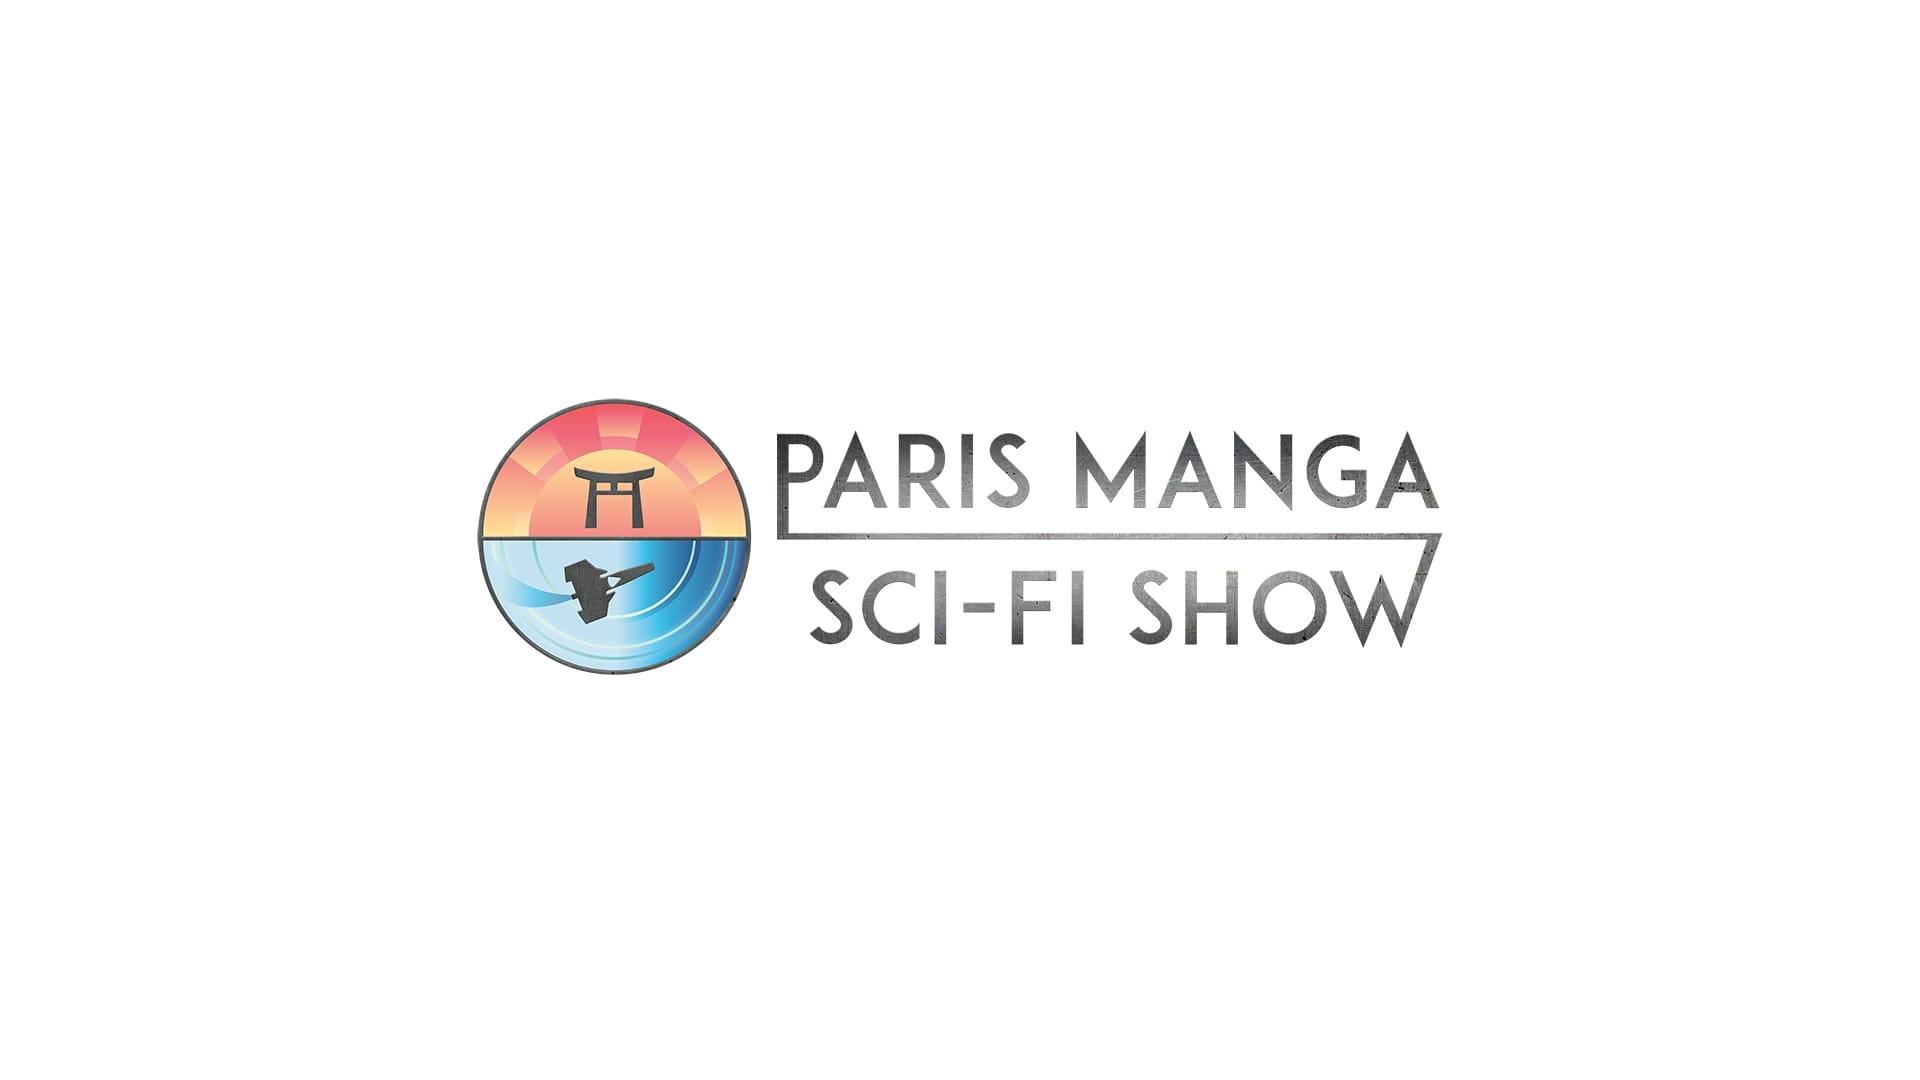 Paris Manga & Sci-Fi Show logo convention pop cuilture